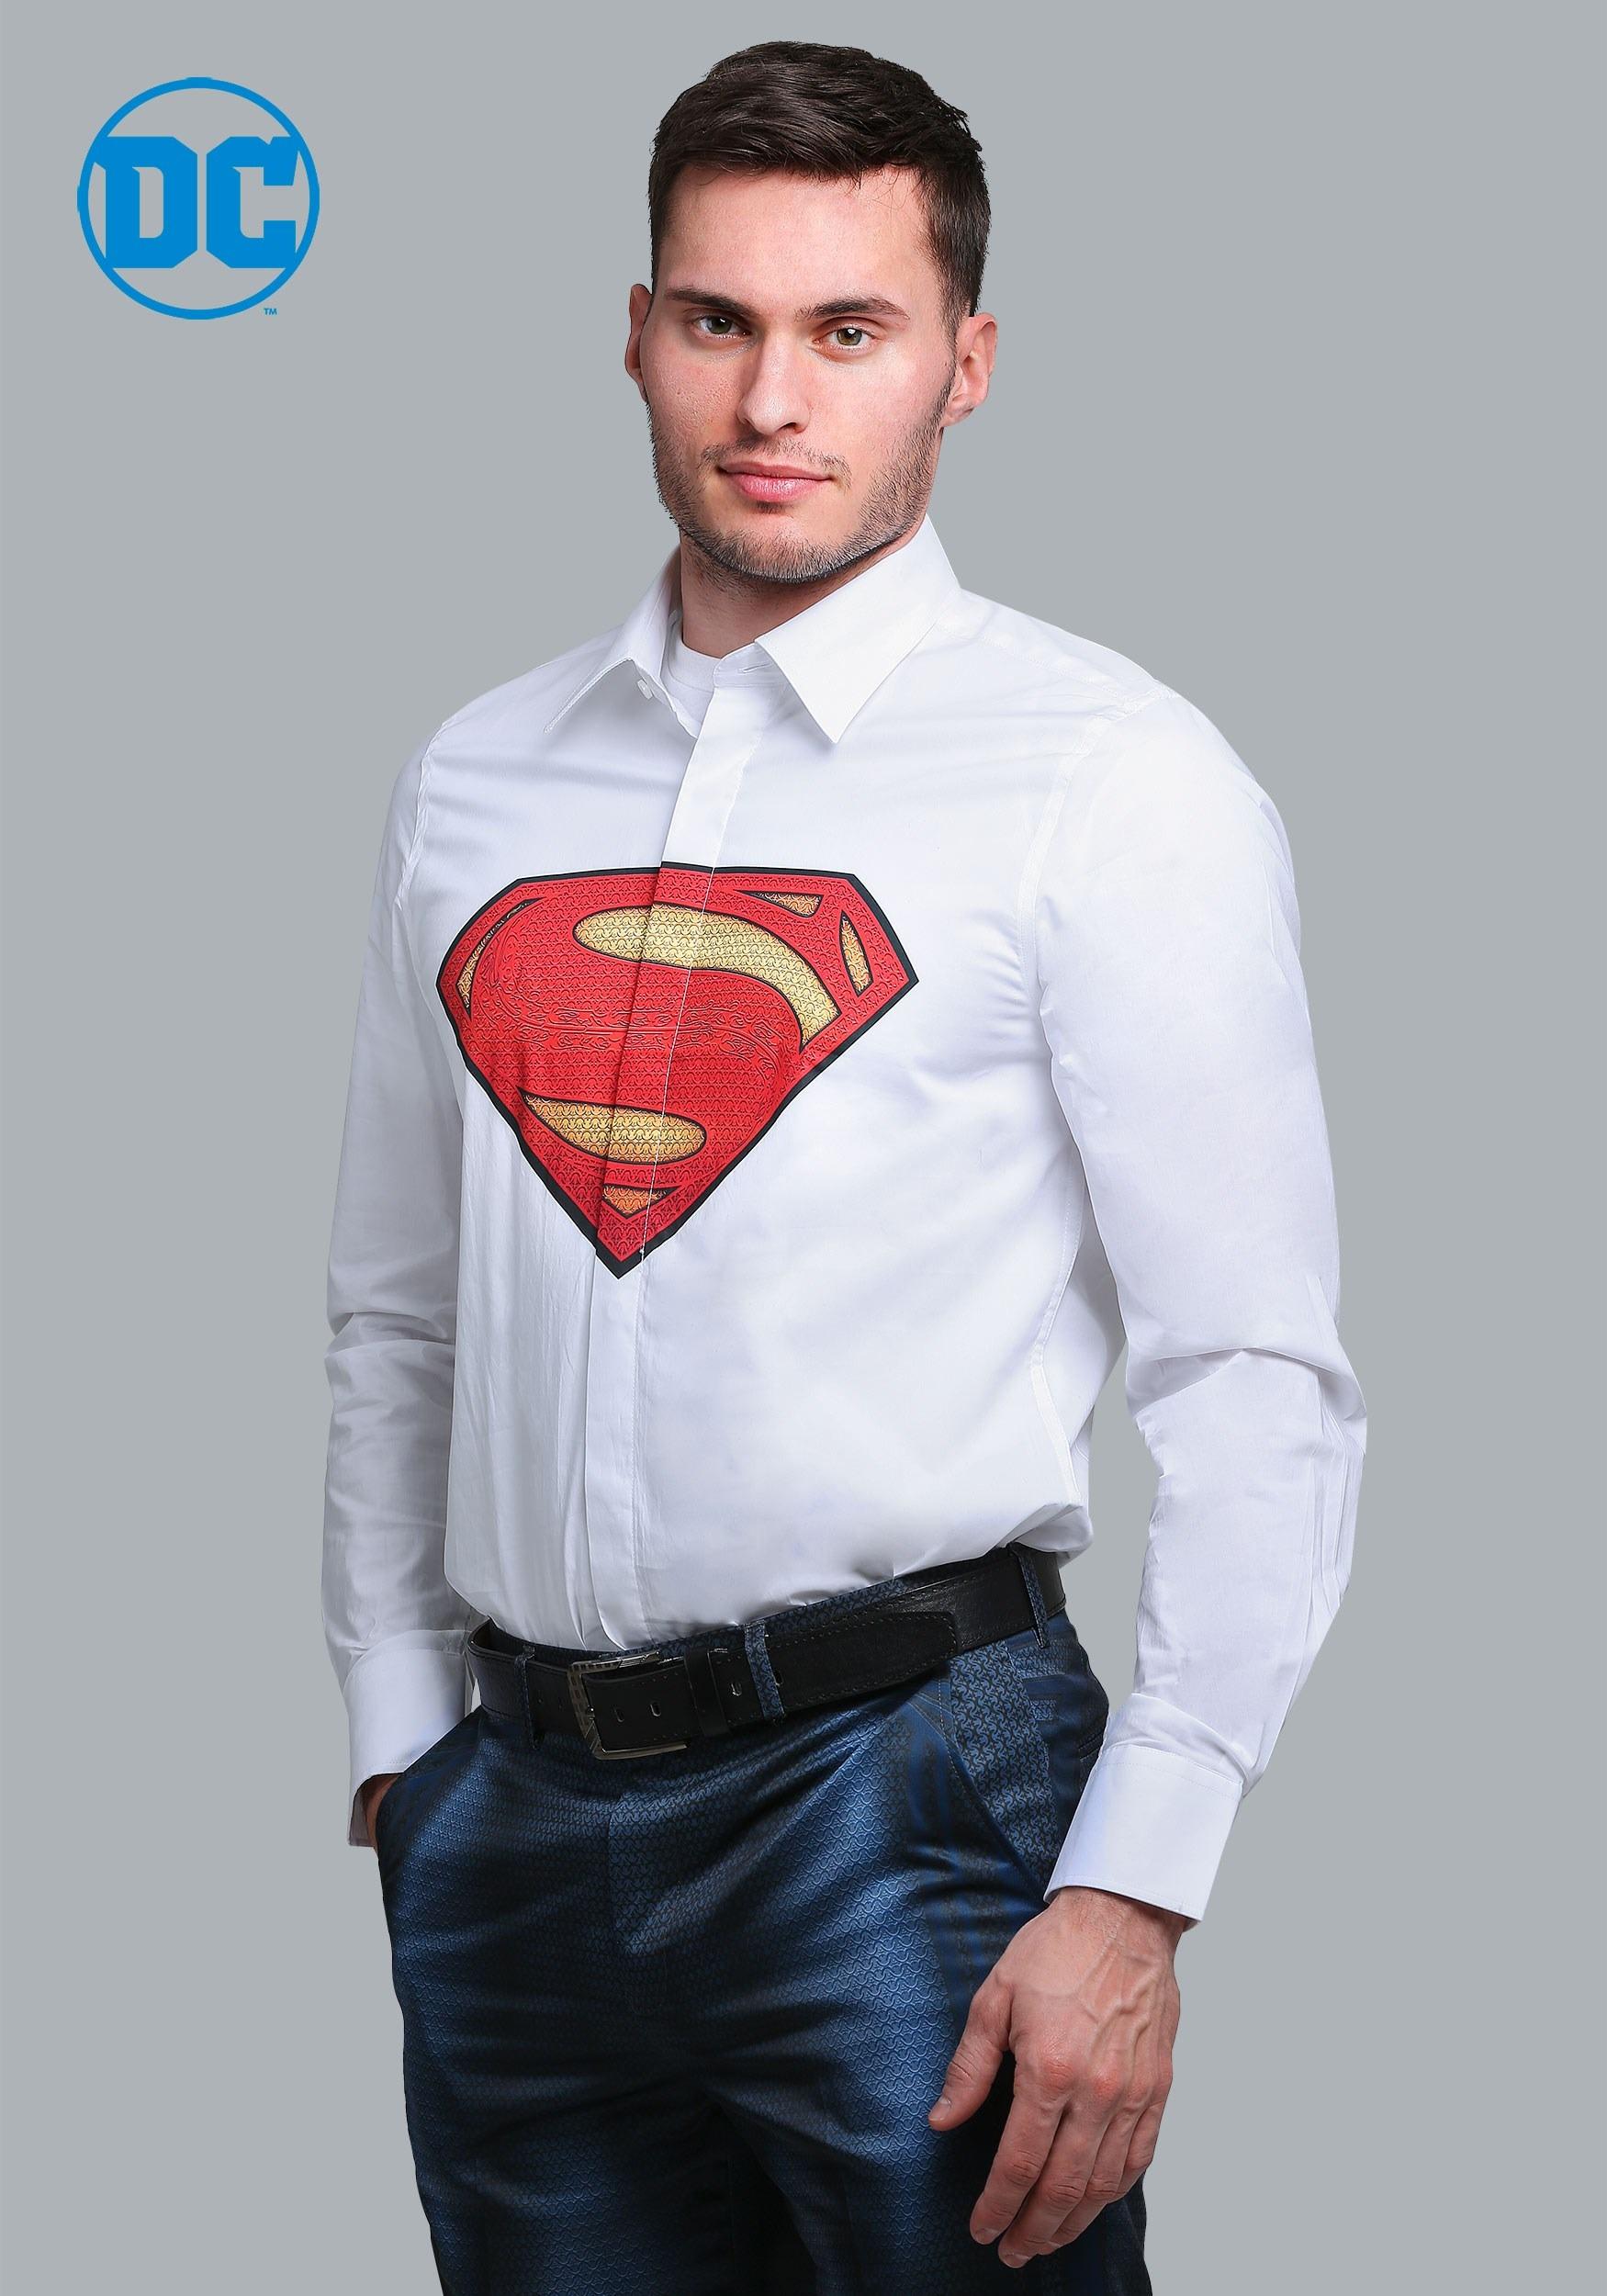 Superman Suit Shirt (Alter Ego)  sc 1 st  Halloween Costumes & Superman Slim Fit Dress Shirt (Alter Ego)